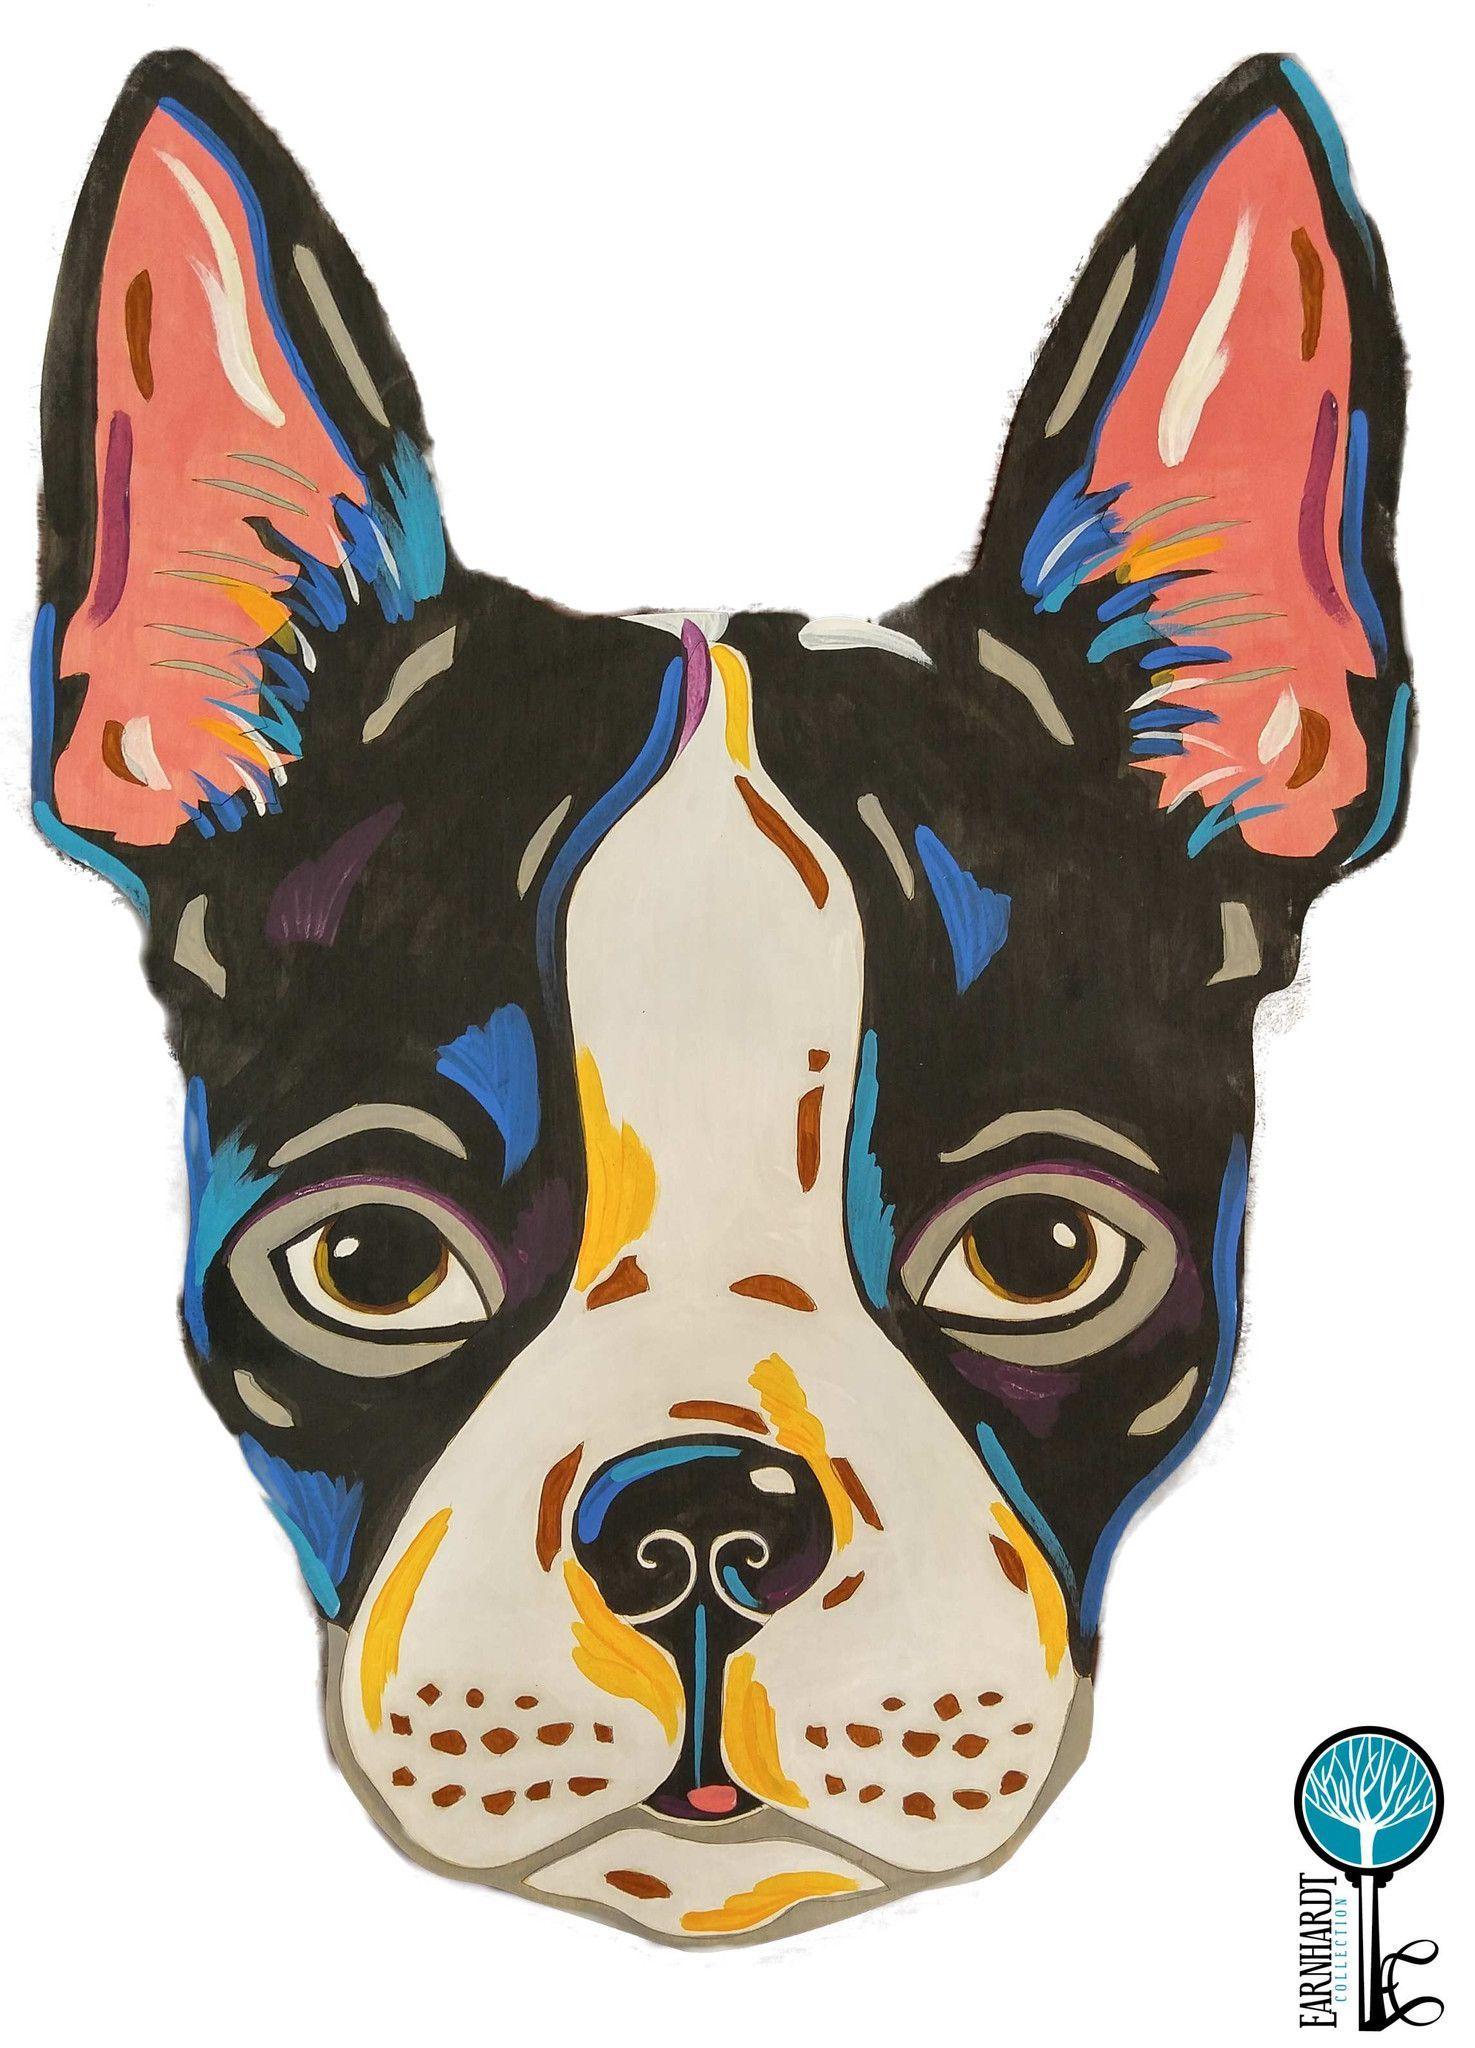 11X14 BOSTON TERRIER PUPPIES Signed Dog Art PRINT of Original Oil Painting VERN